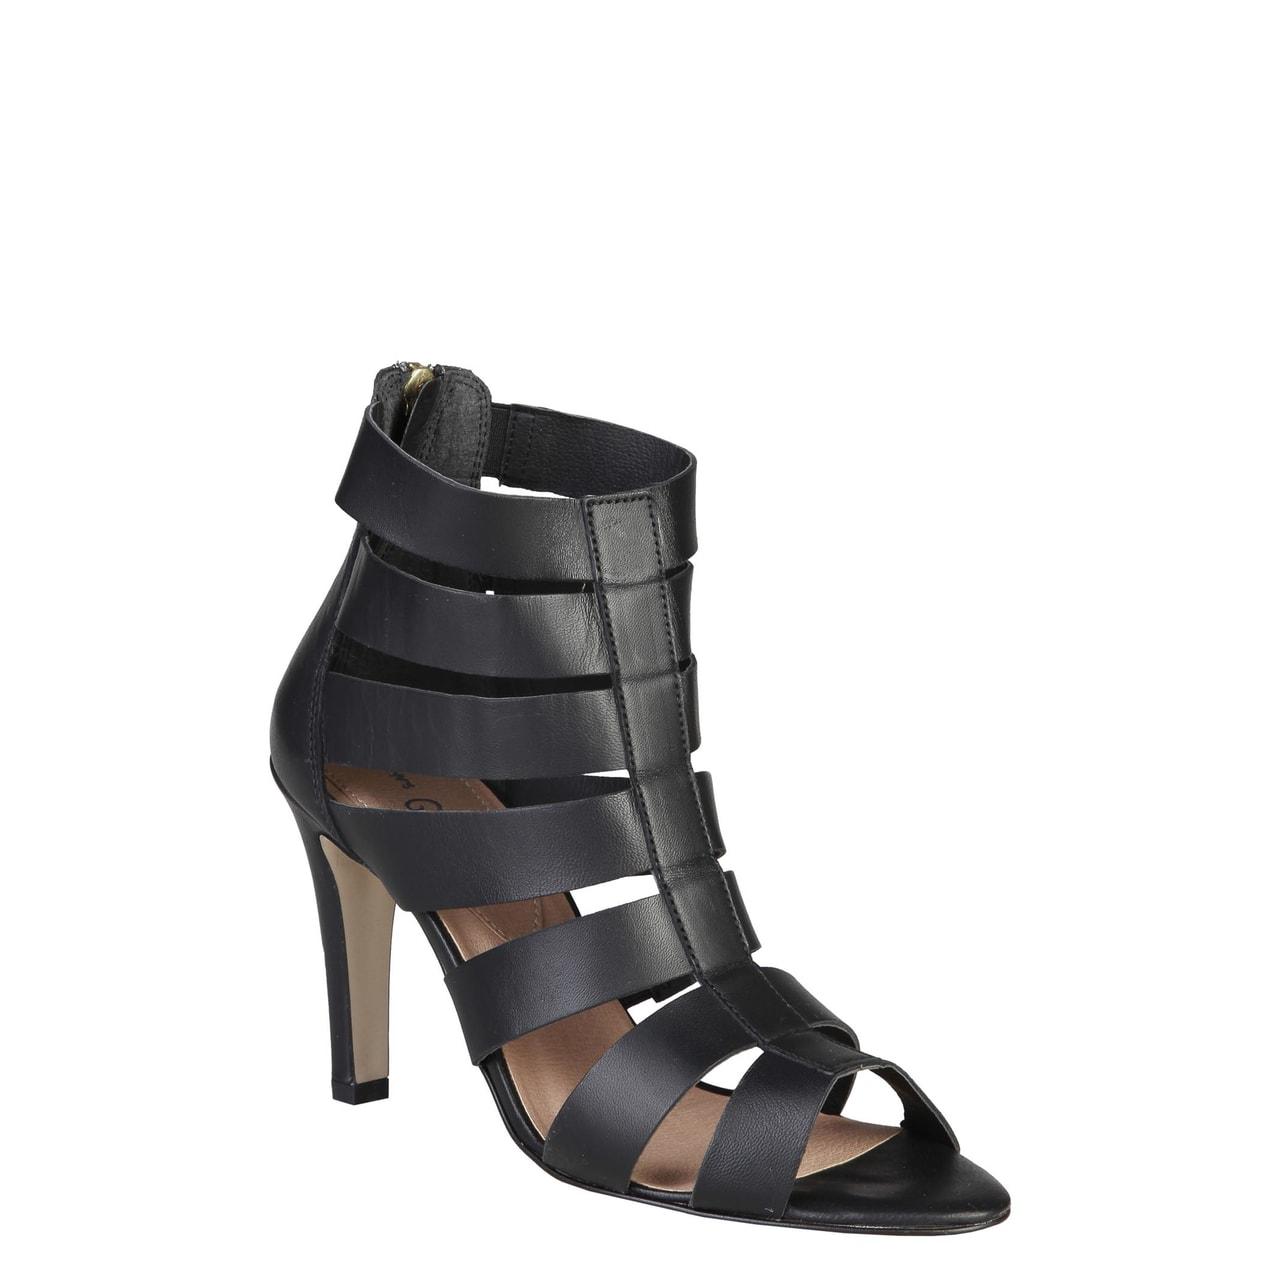 a2168f50b5 Glamadise.sk - Dámske kožené páskové sandále čierne - Pierre Cardin ...